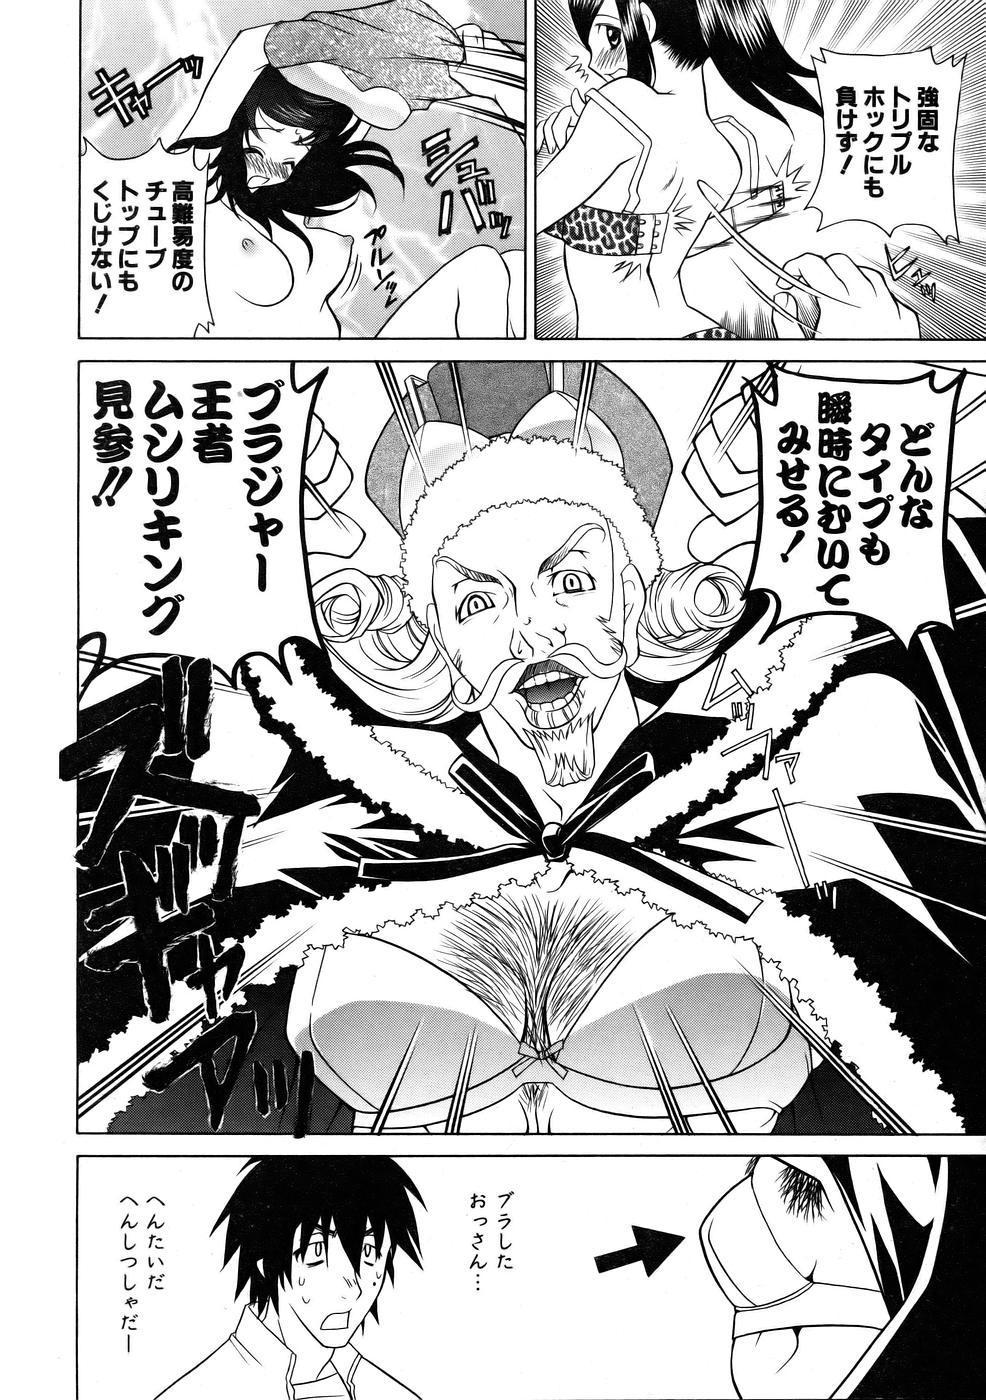 COMIC AUN 2005-10 Vol. 113 305